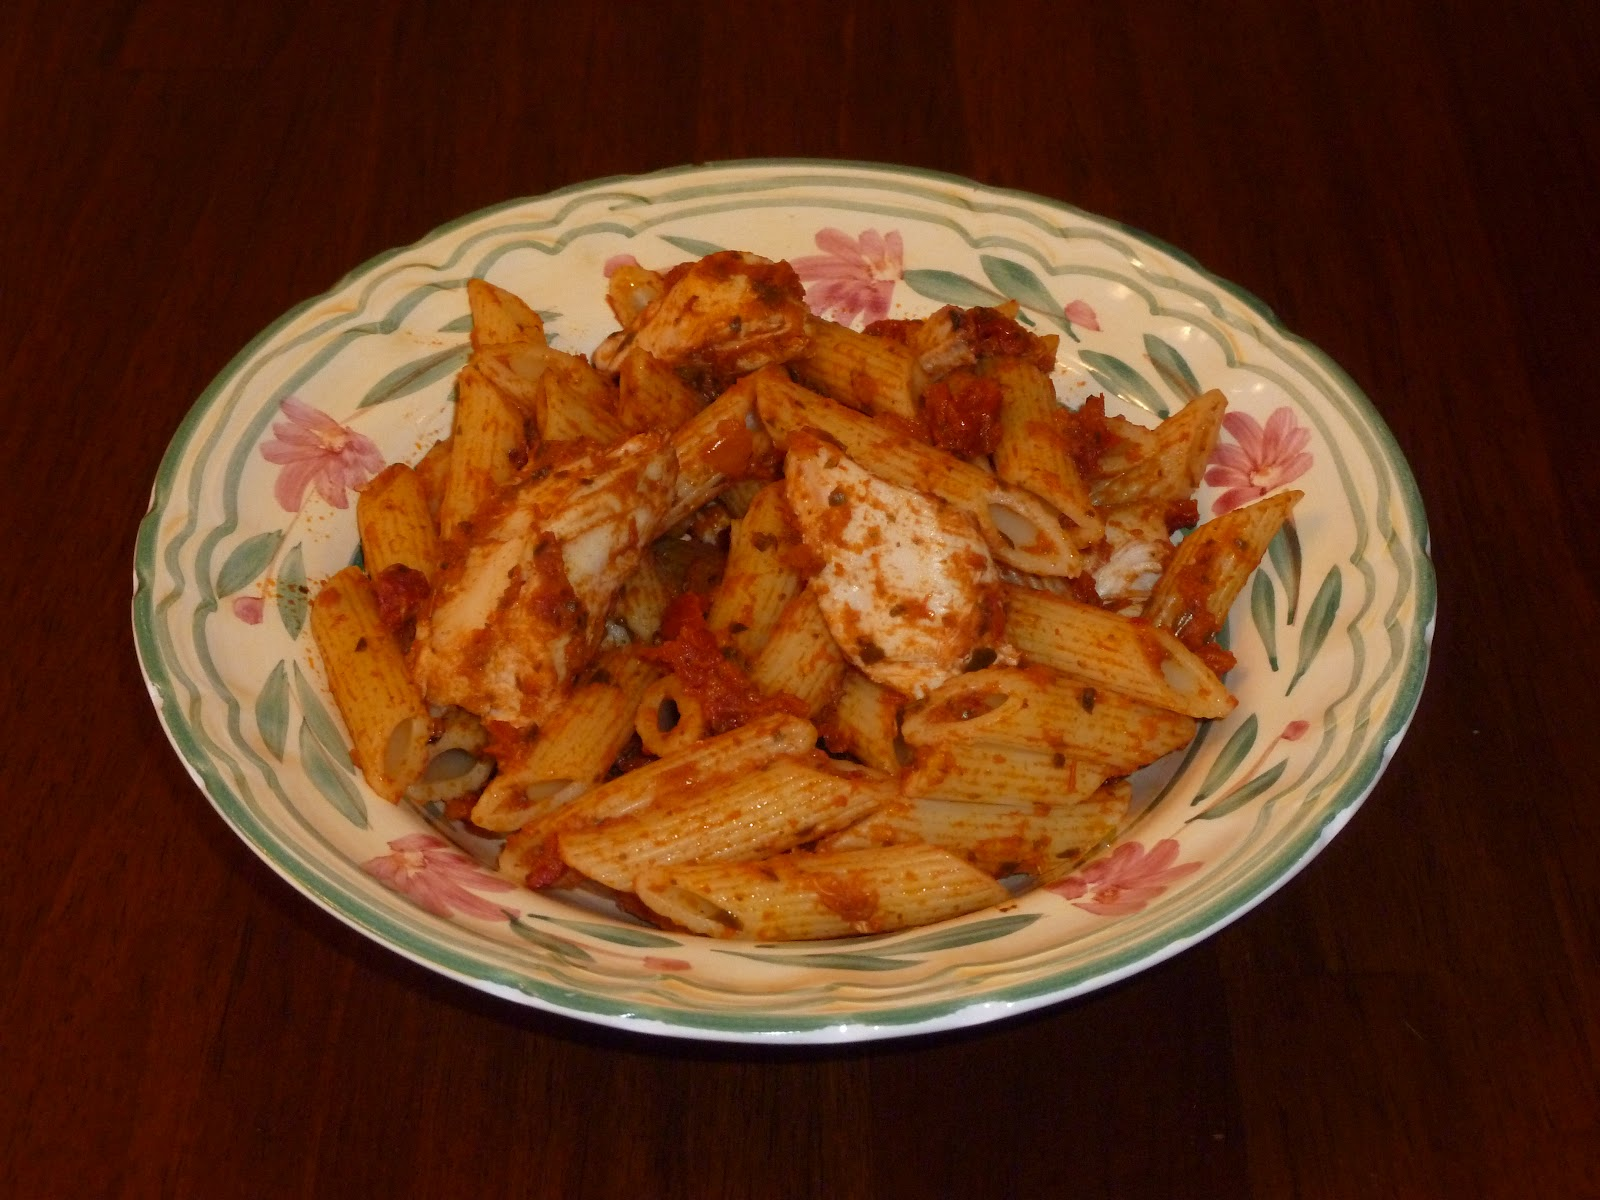 ... chicken (I just use leftover chicken & jarred pesto sauce), a salad